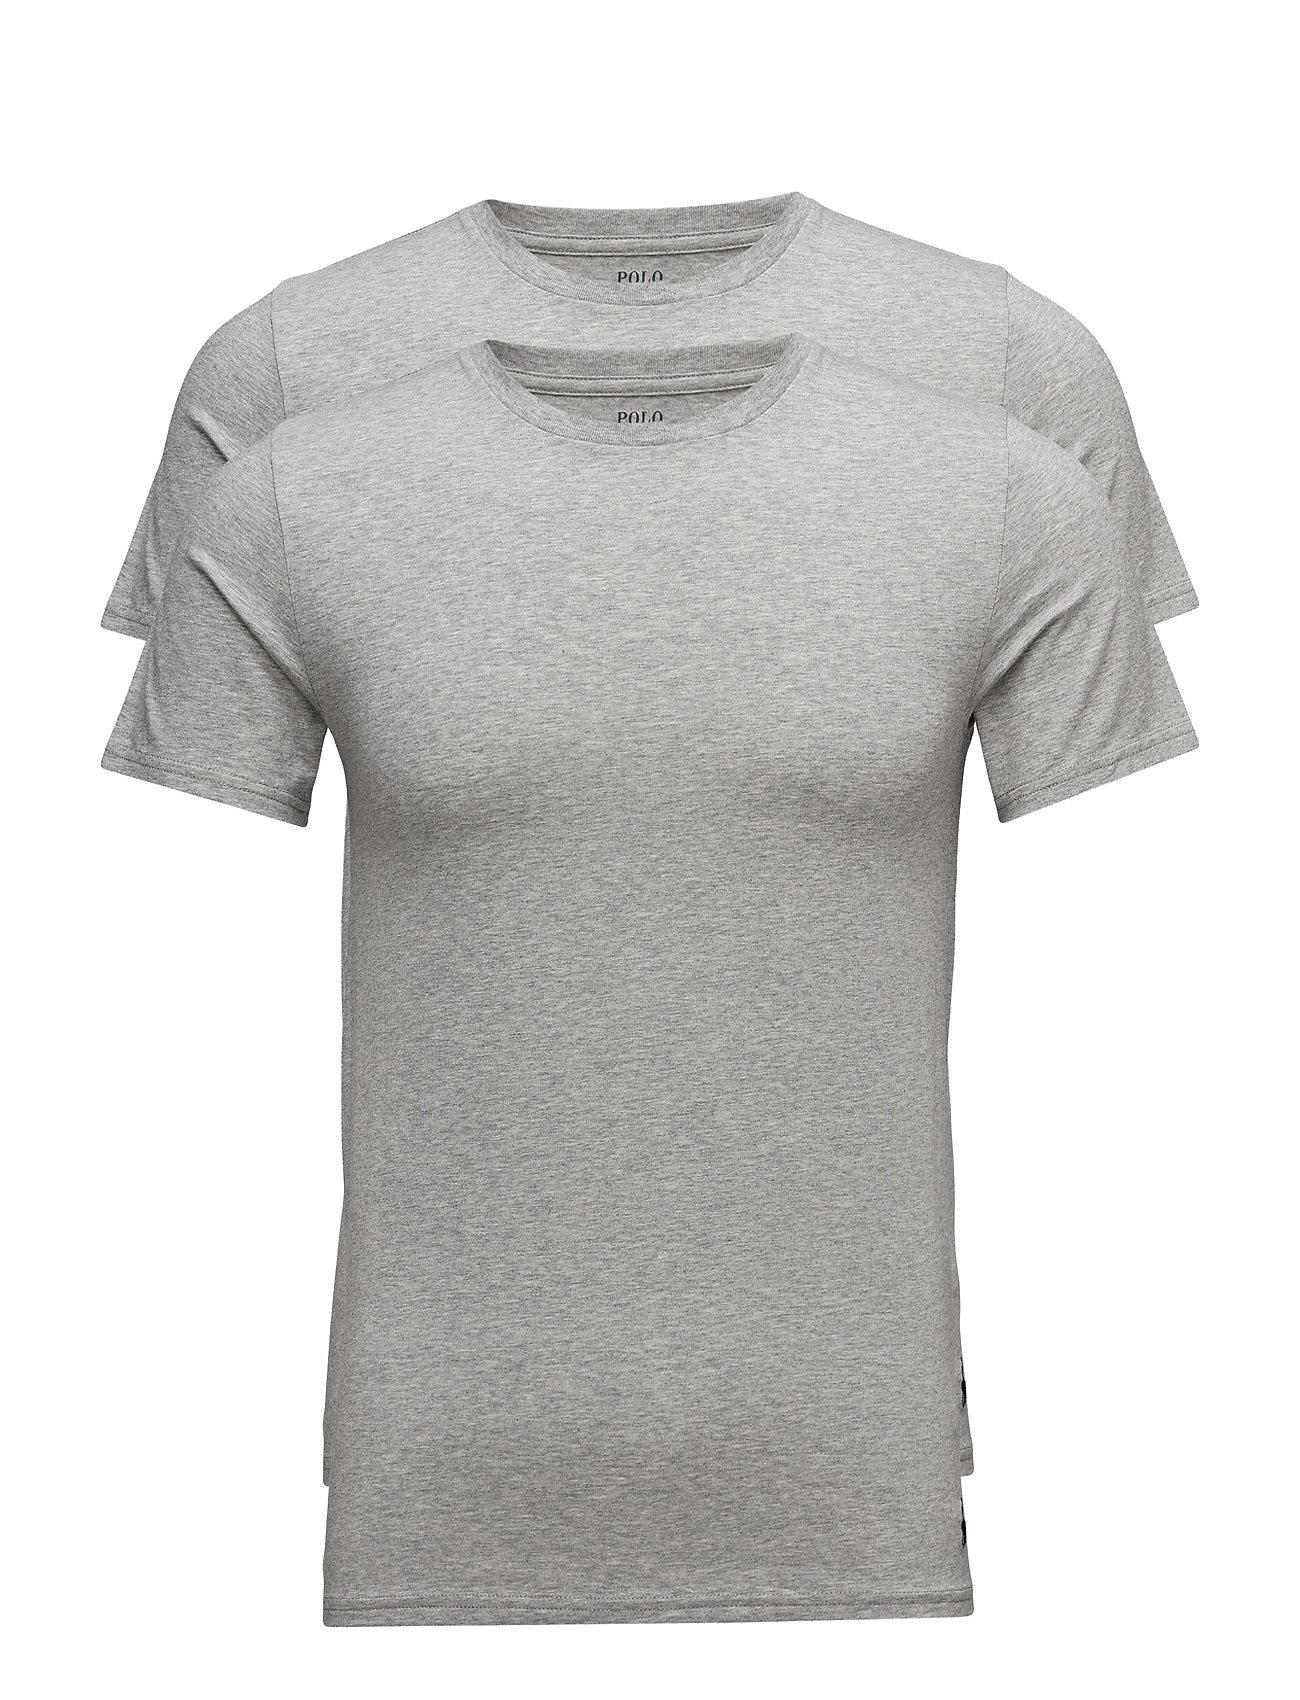 Polo Ralph Lauren Underwear Crewneck T-Shirt 2-Pack